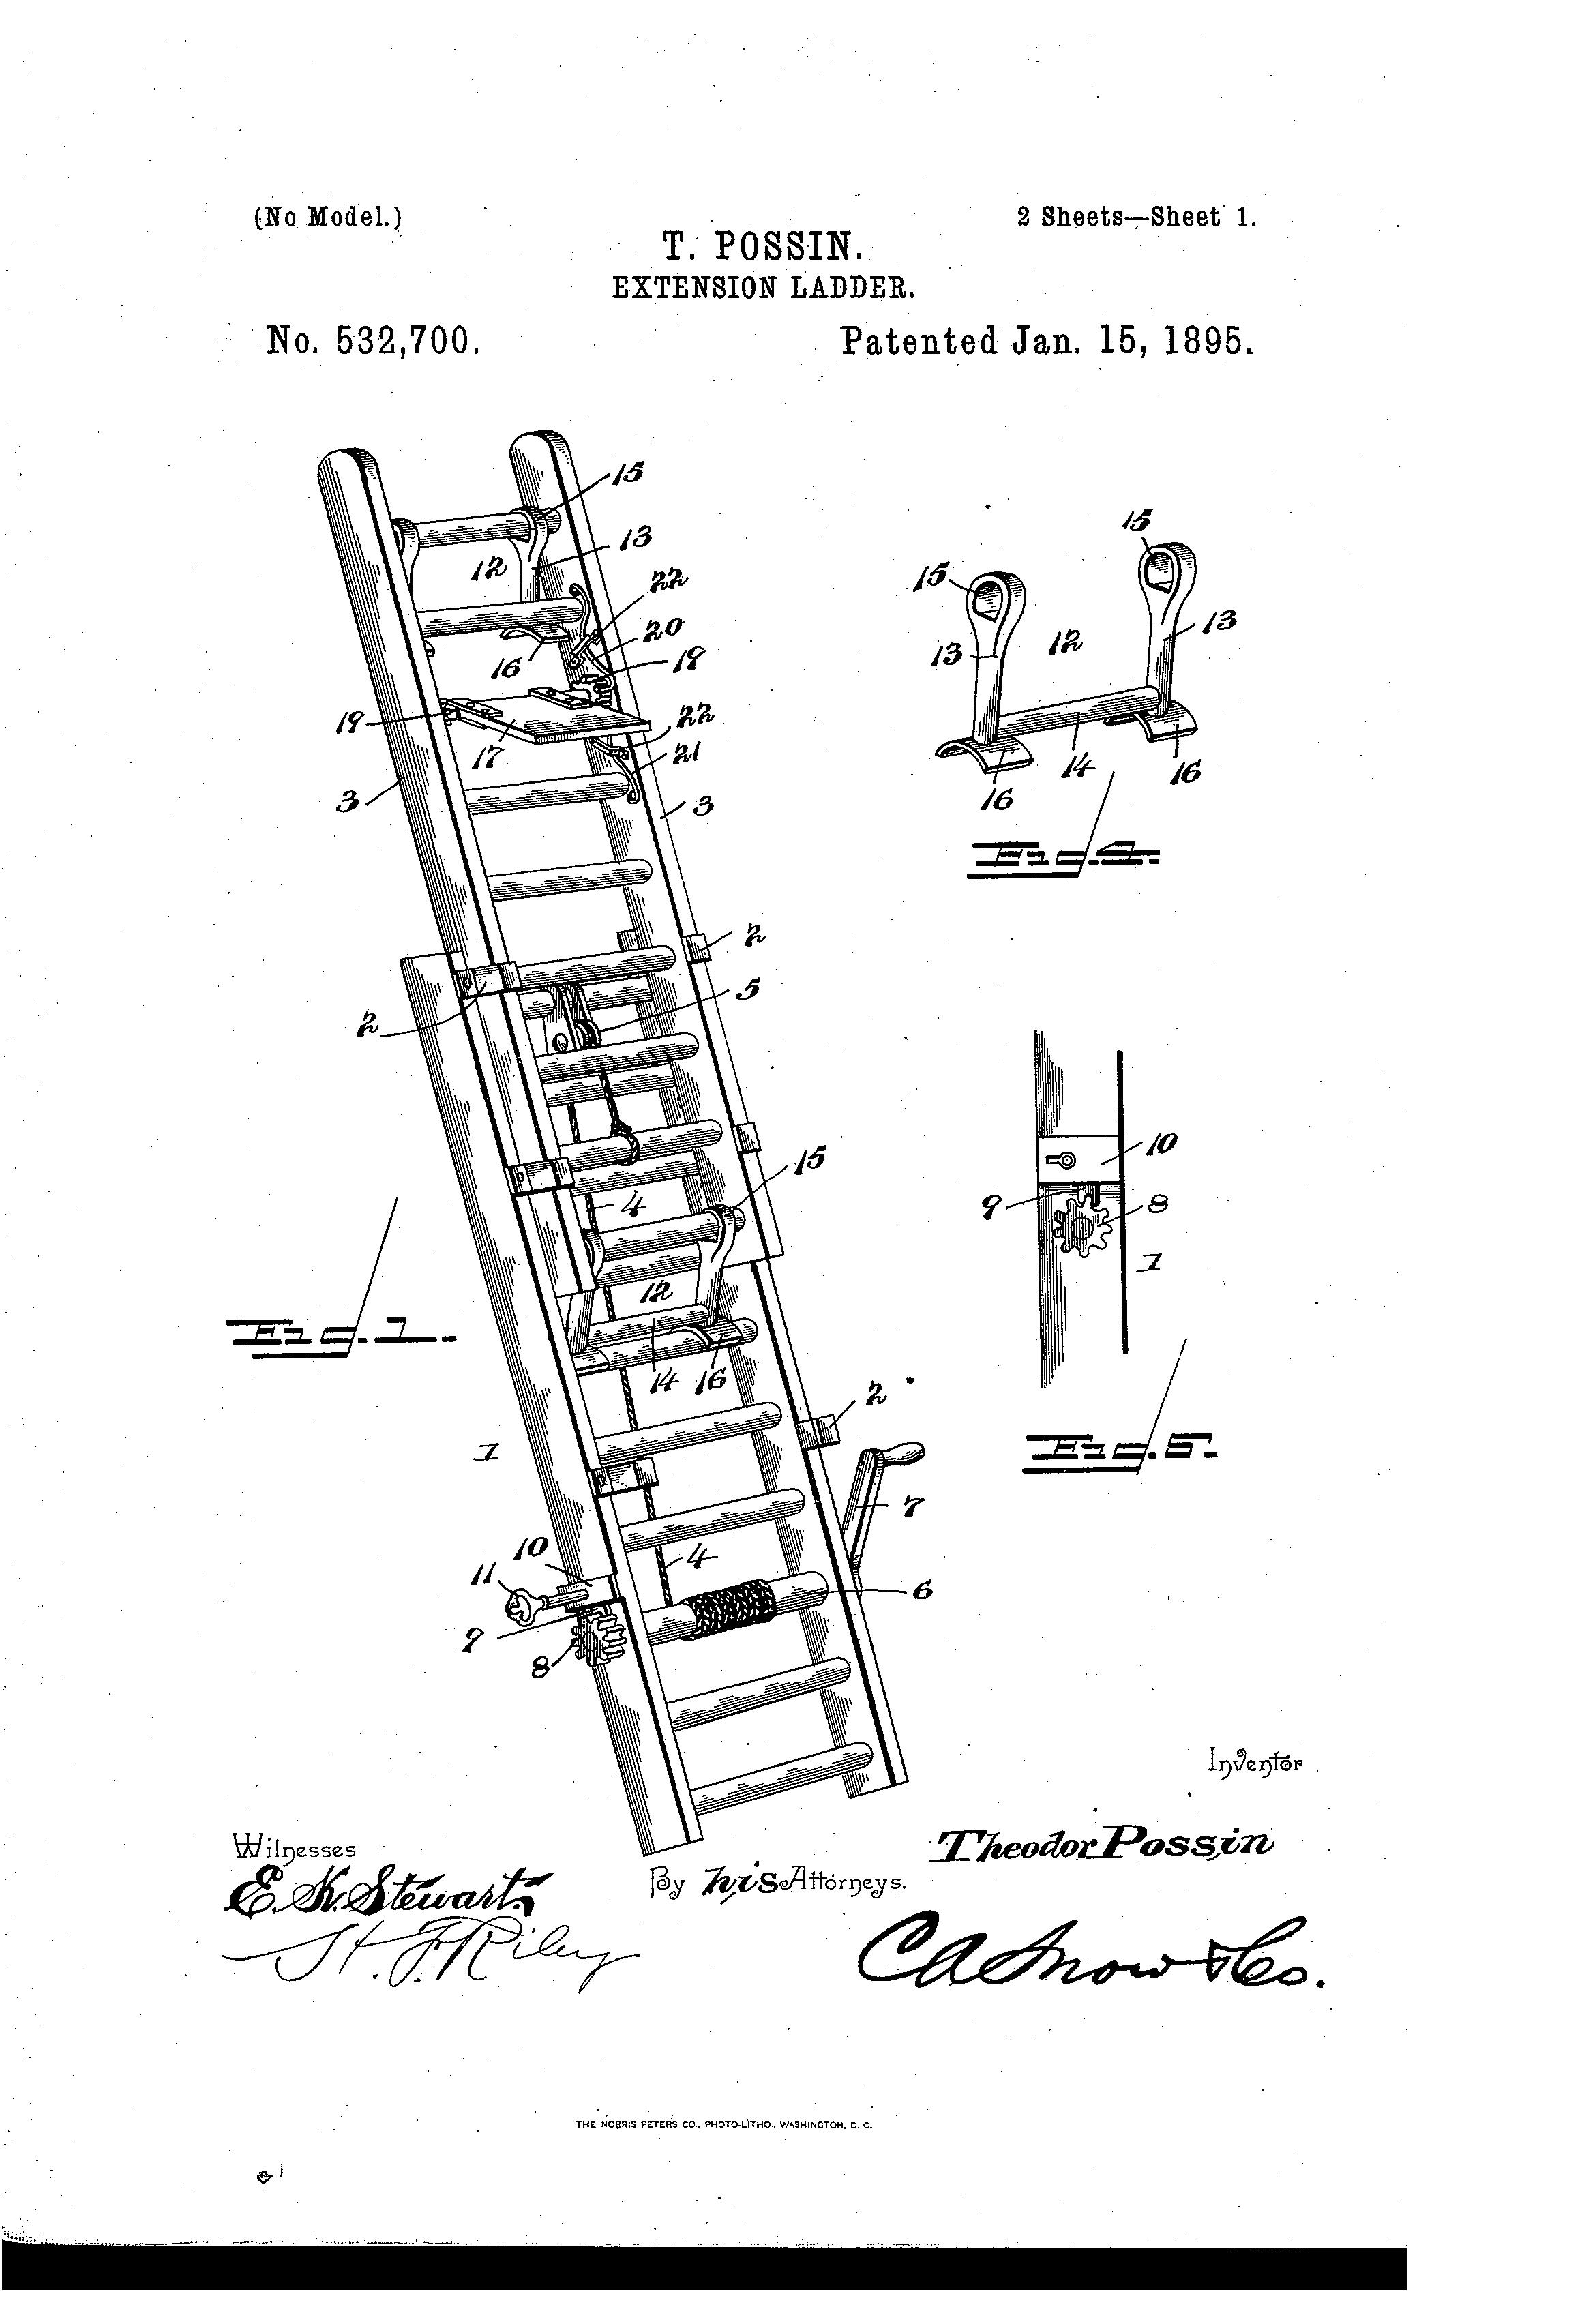 Extension Ladder Parts : Patent us extension ladder google patents